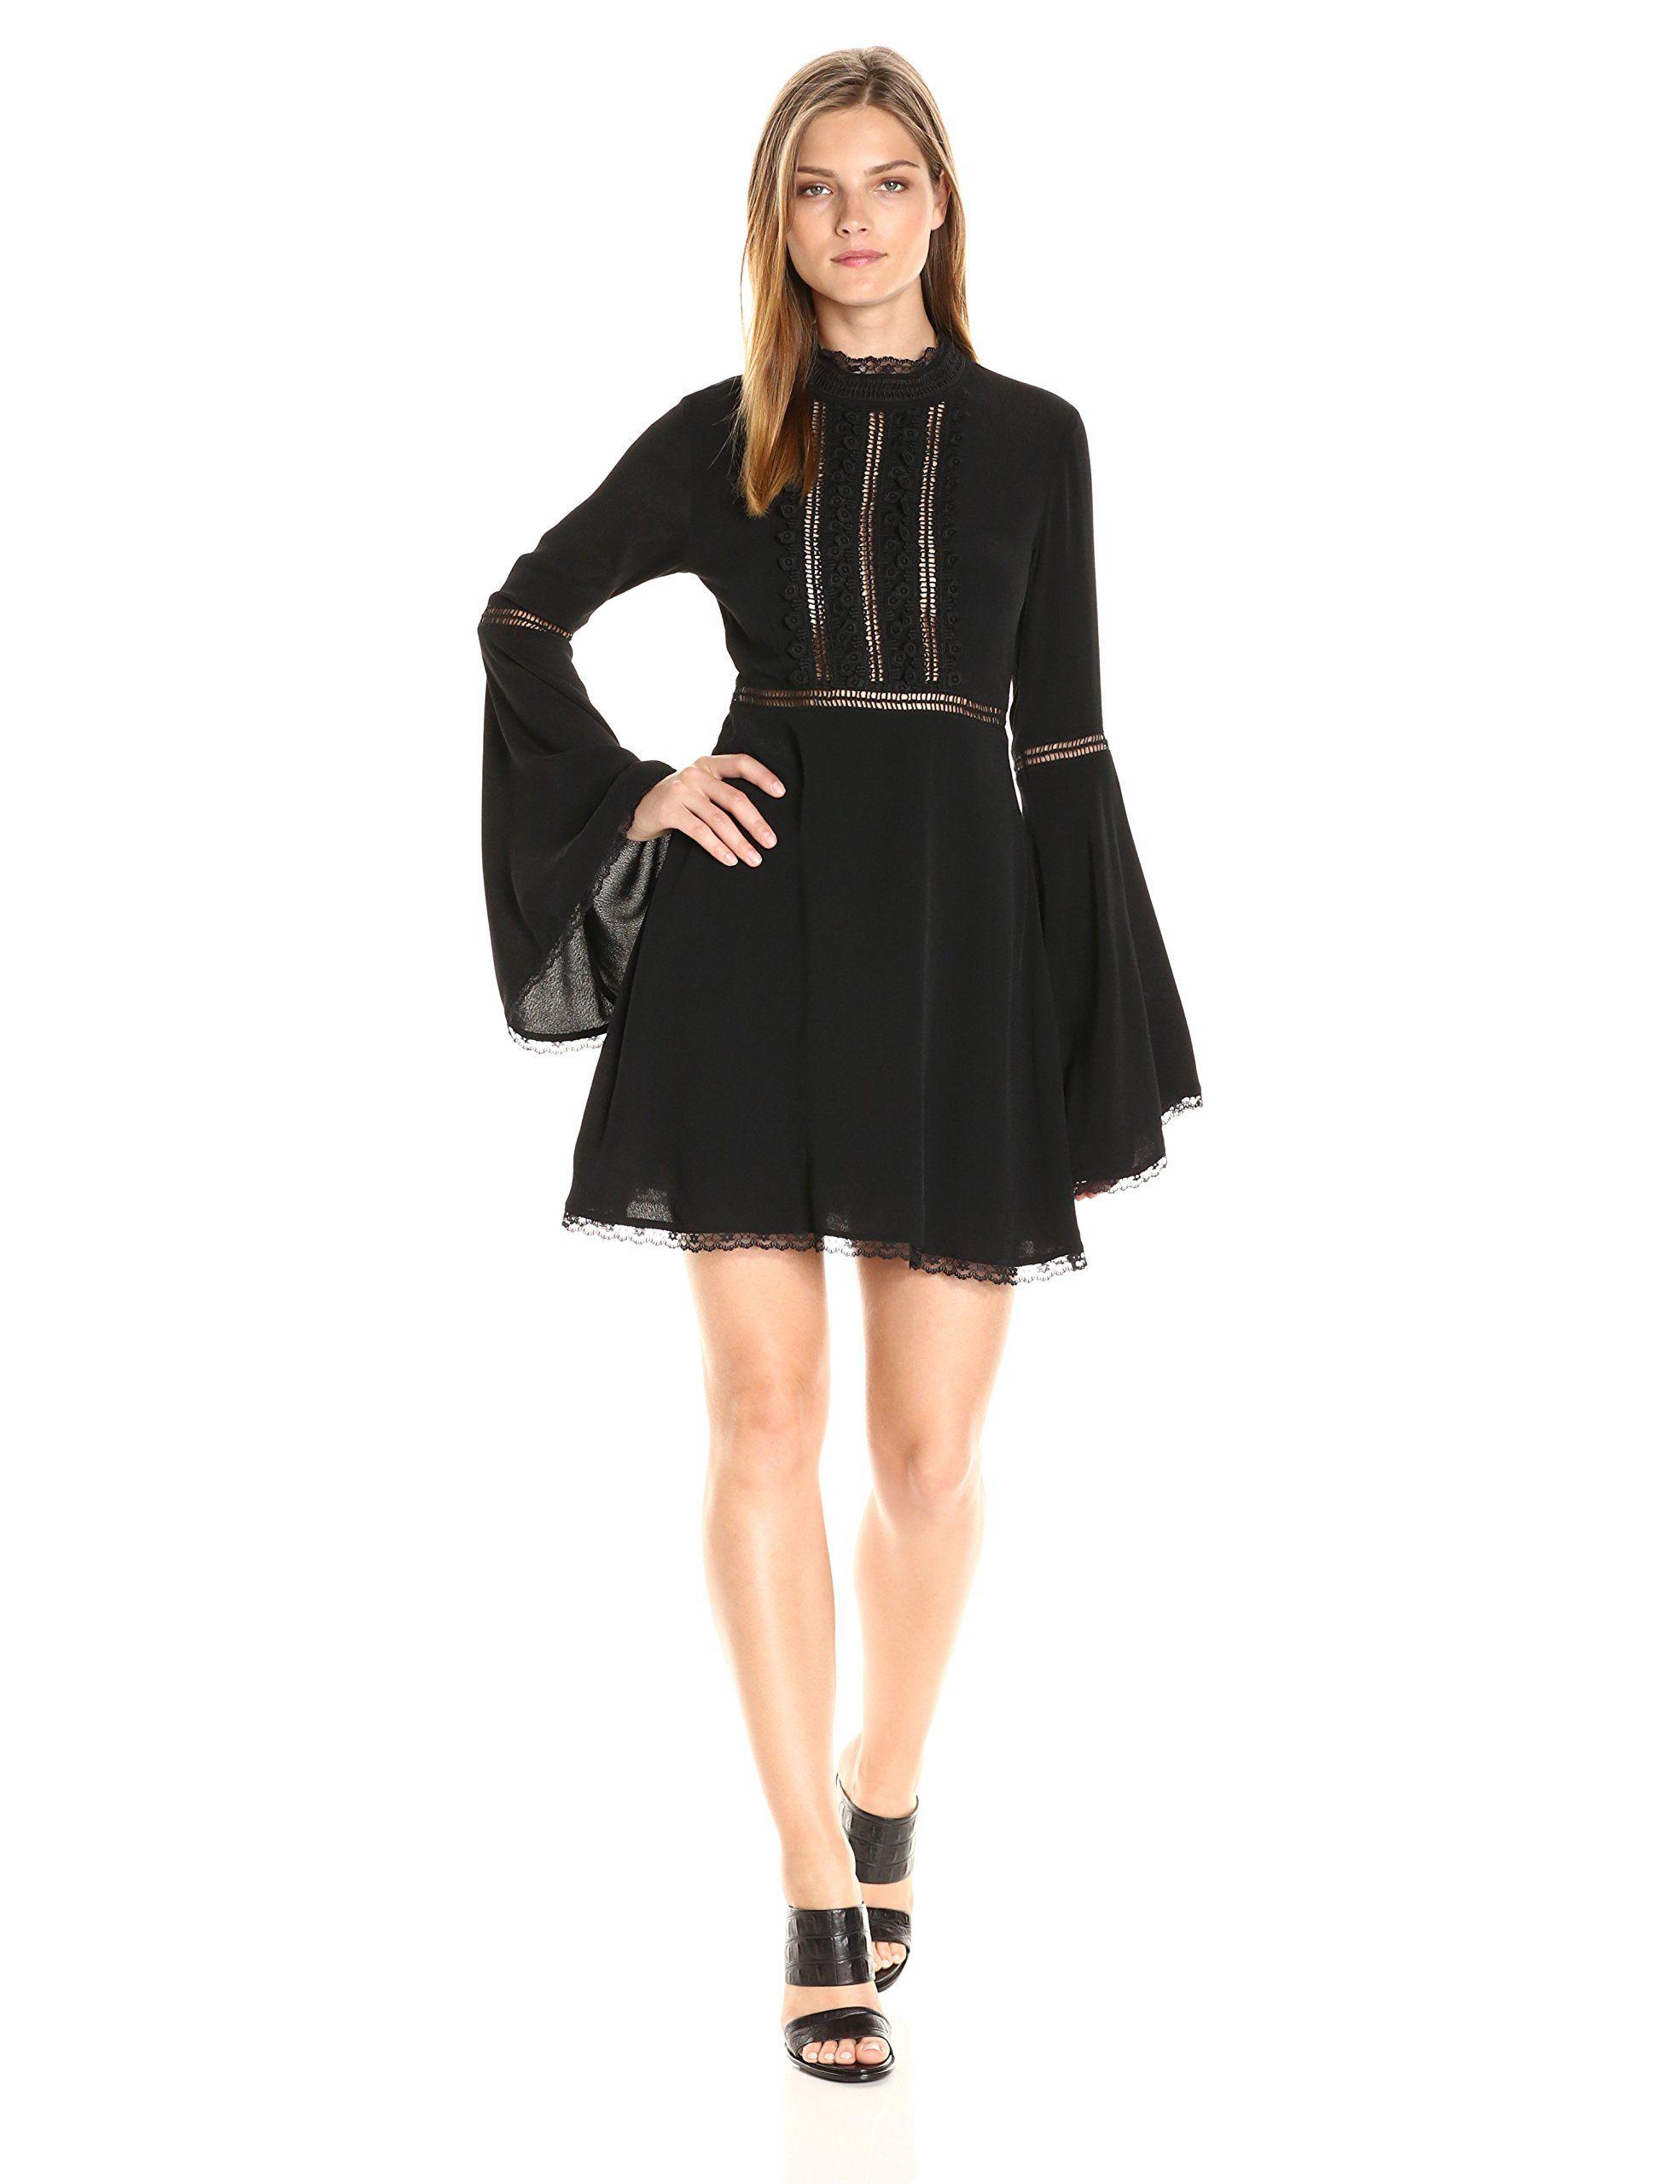 For Love Bell Sleeve Dress Clothes Design Short Mini Dress [ 2560 x 1969 Pixel ]